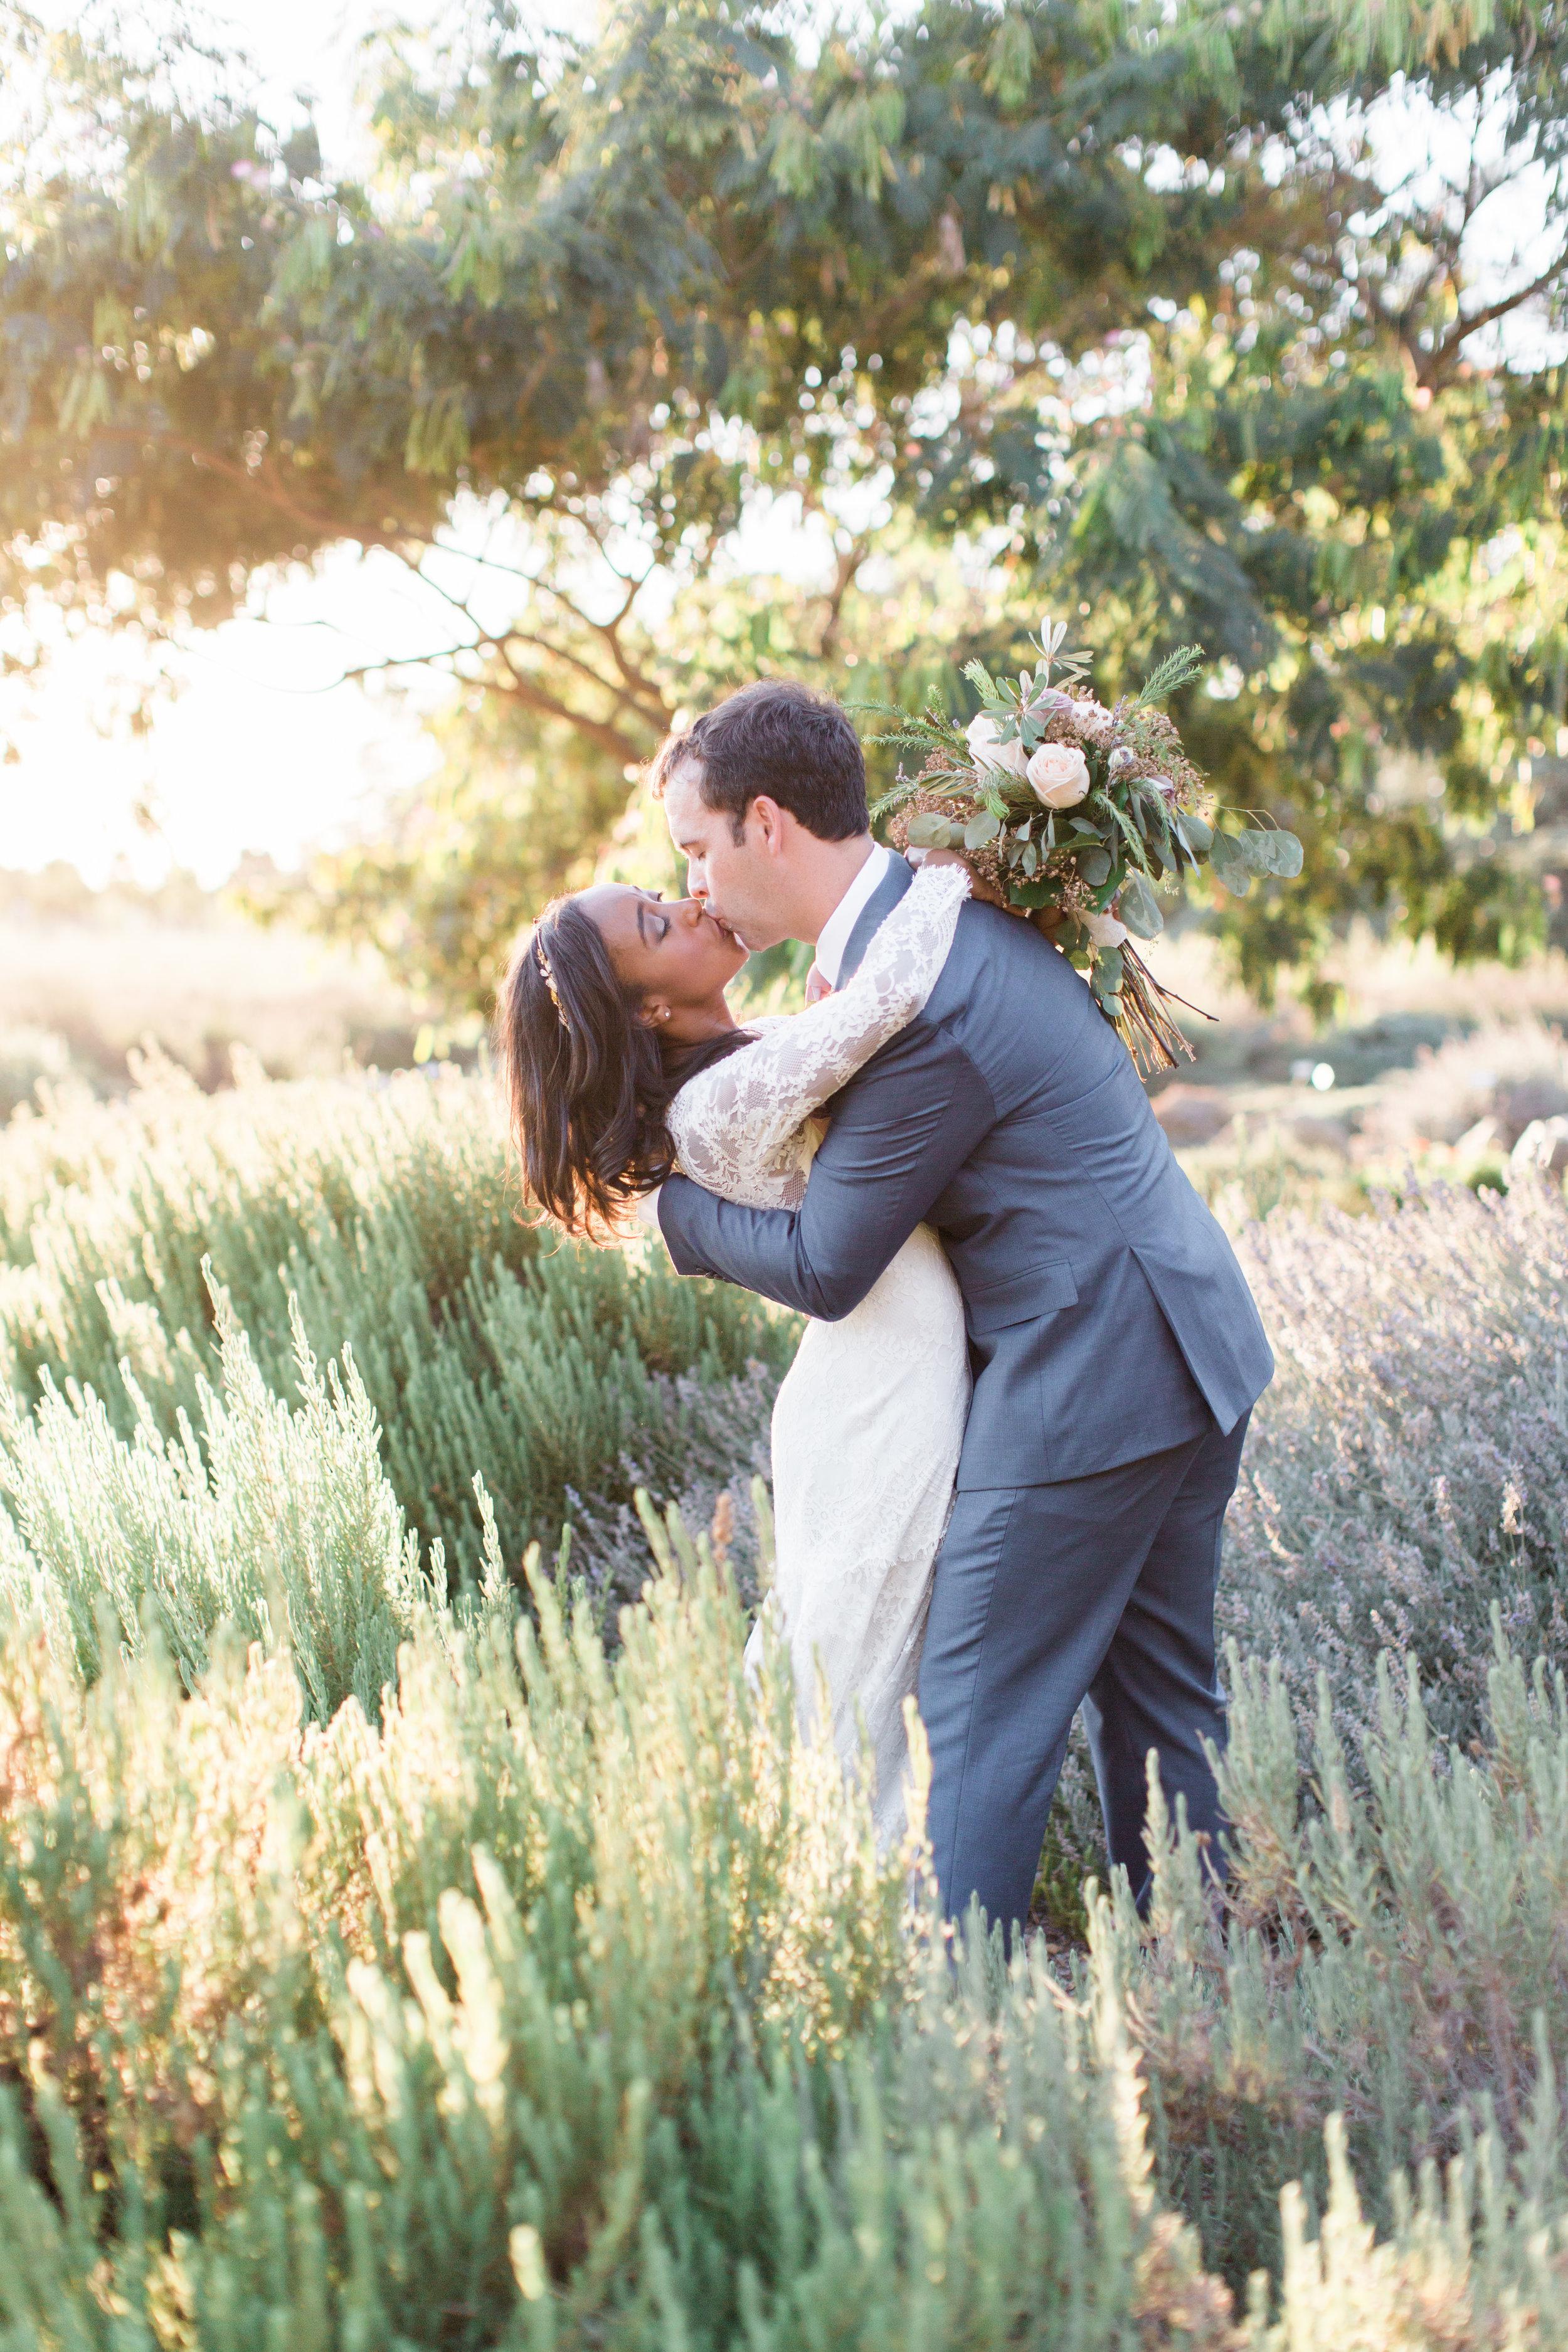 Jenny Quicksall Photography_www.jennyquicksall.com_California Wedding Photographer_Highland Springs Ranch and Inn Resort_Cherry Valley California (52).JPG